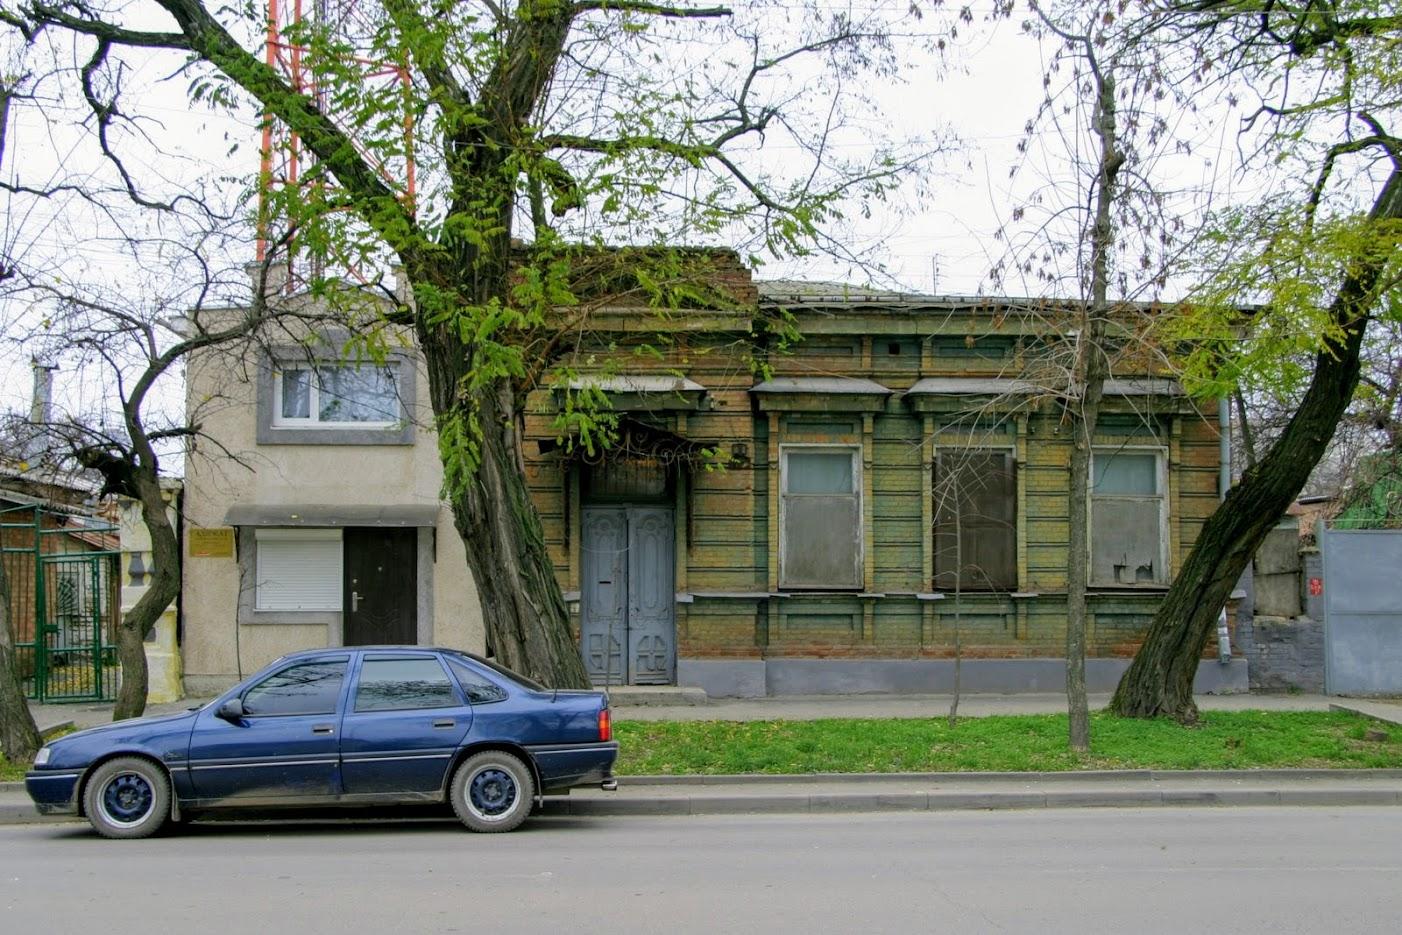 https://sites.google.com/site/istoriceskijtaganrog/cehova-ulica/dom-66